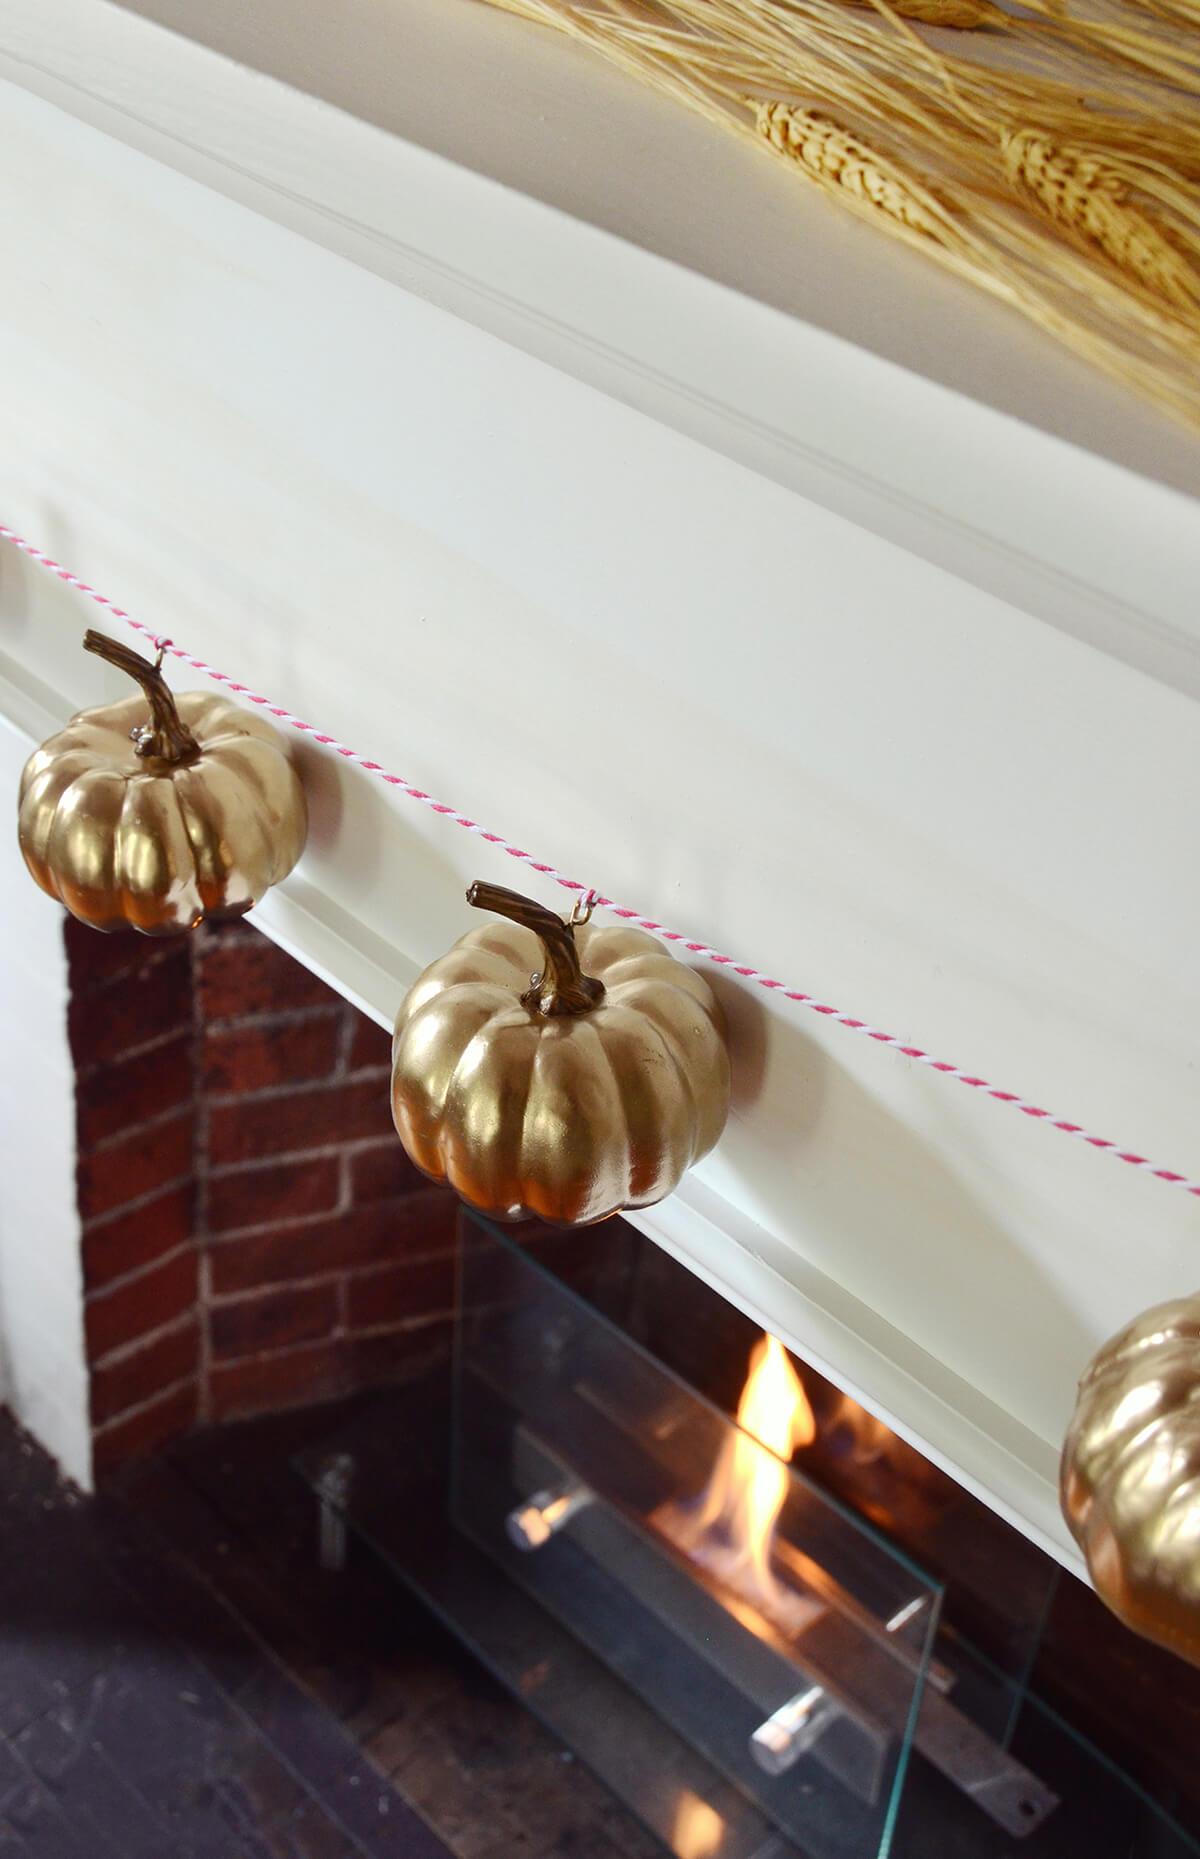 Pumpkins Boasting a Gleaming Gold Coat